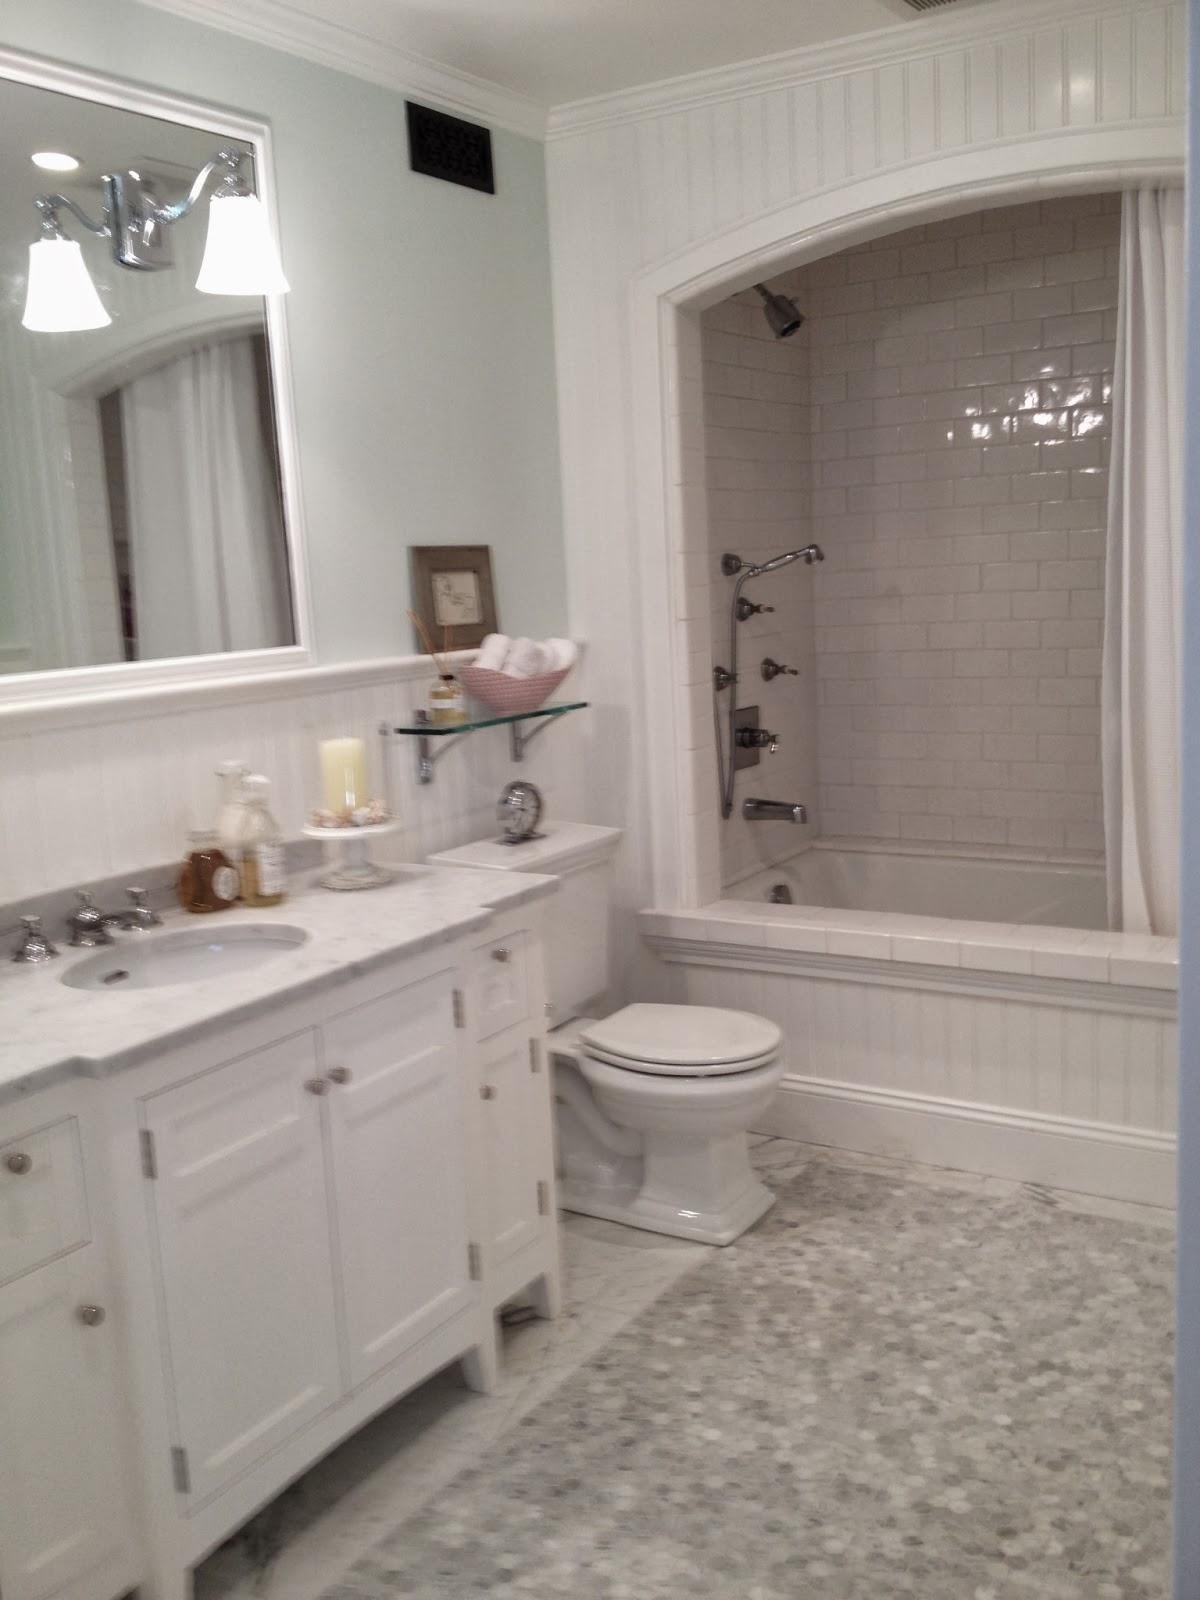 home depot financing kitchen remodel interior design mortgage loans caroline gerardo white bathroom